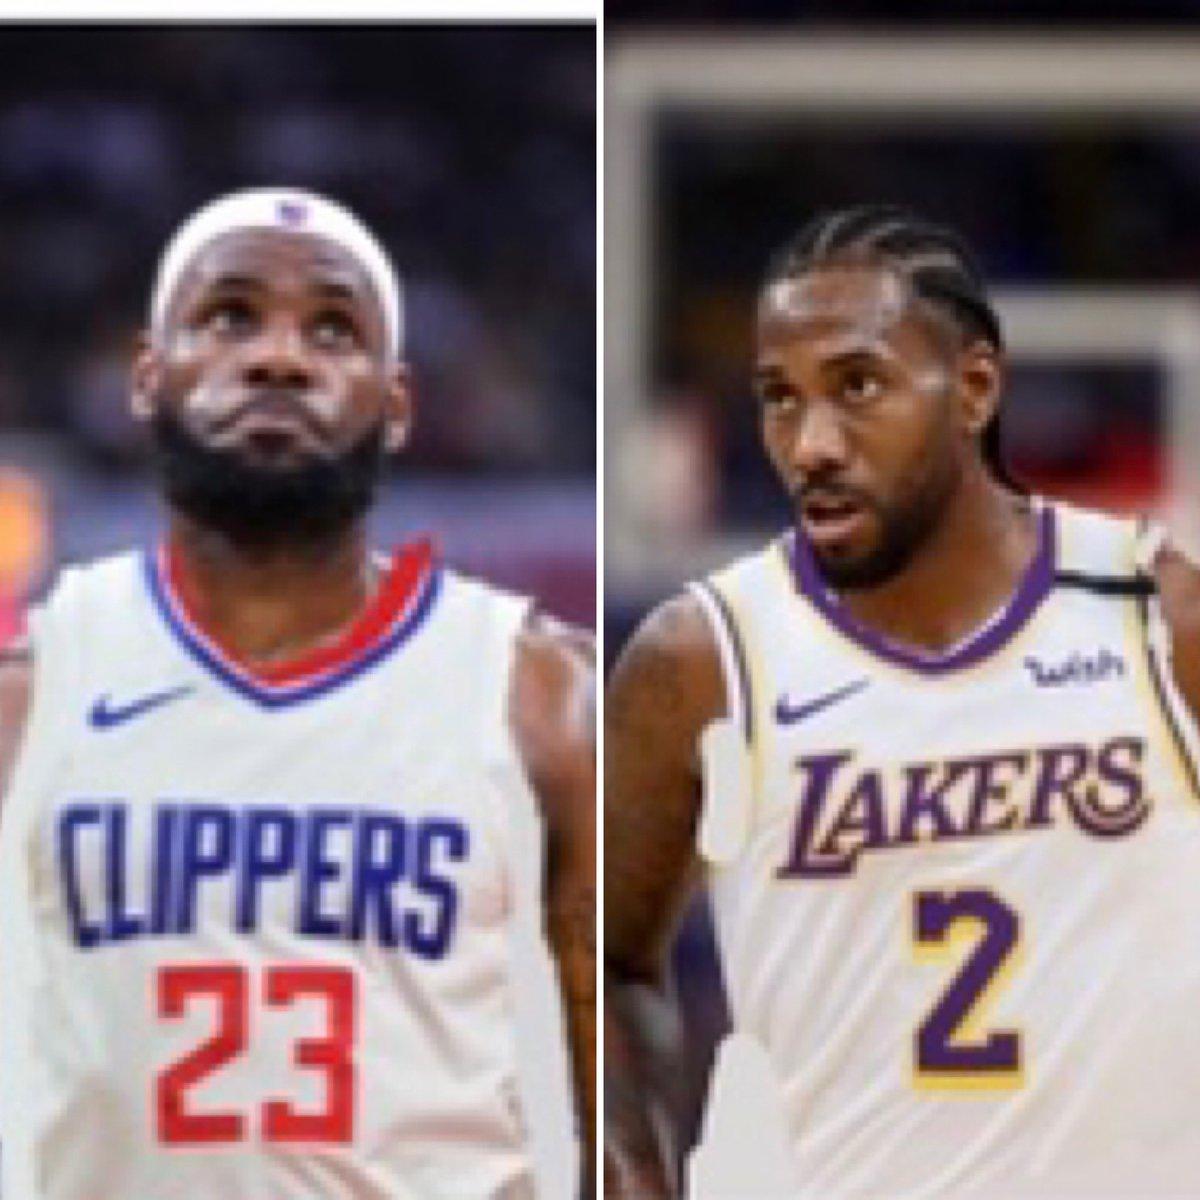 if @KingJames and Kawhi Leonard swapped teams which side are you rolling with? follow @nba_editsss23 for more content like this🤝 · · . . #nba #basketball #nike #explorepage #jordan #lebronjames #kawhileonard #stephencurry #dunk #layup #goat #insane #jerseyswap #bucket #kingjames https://t.co/K96EJYMxBU